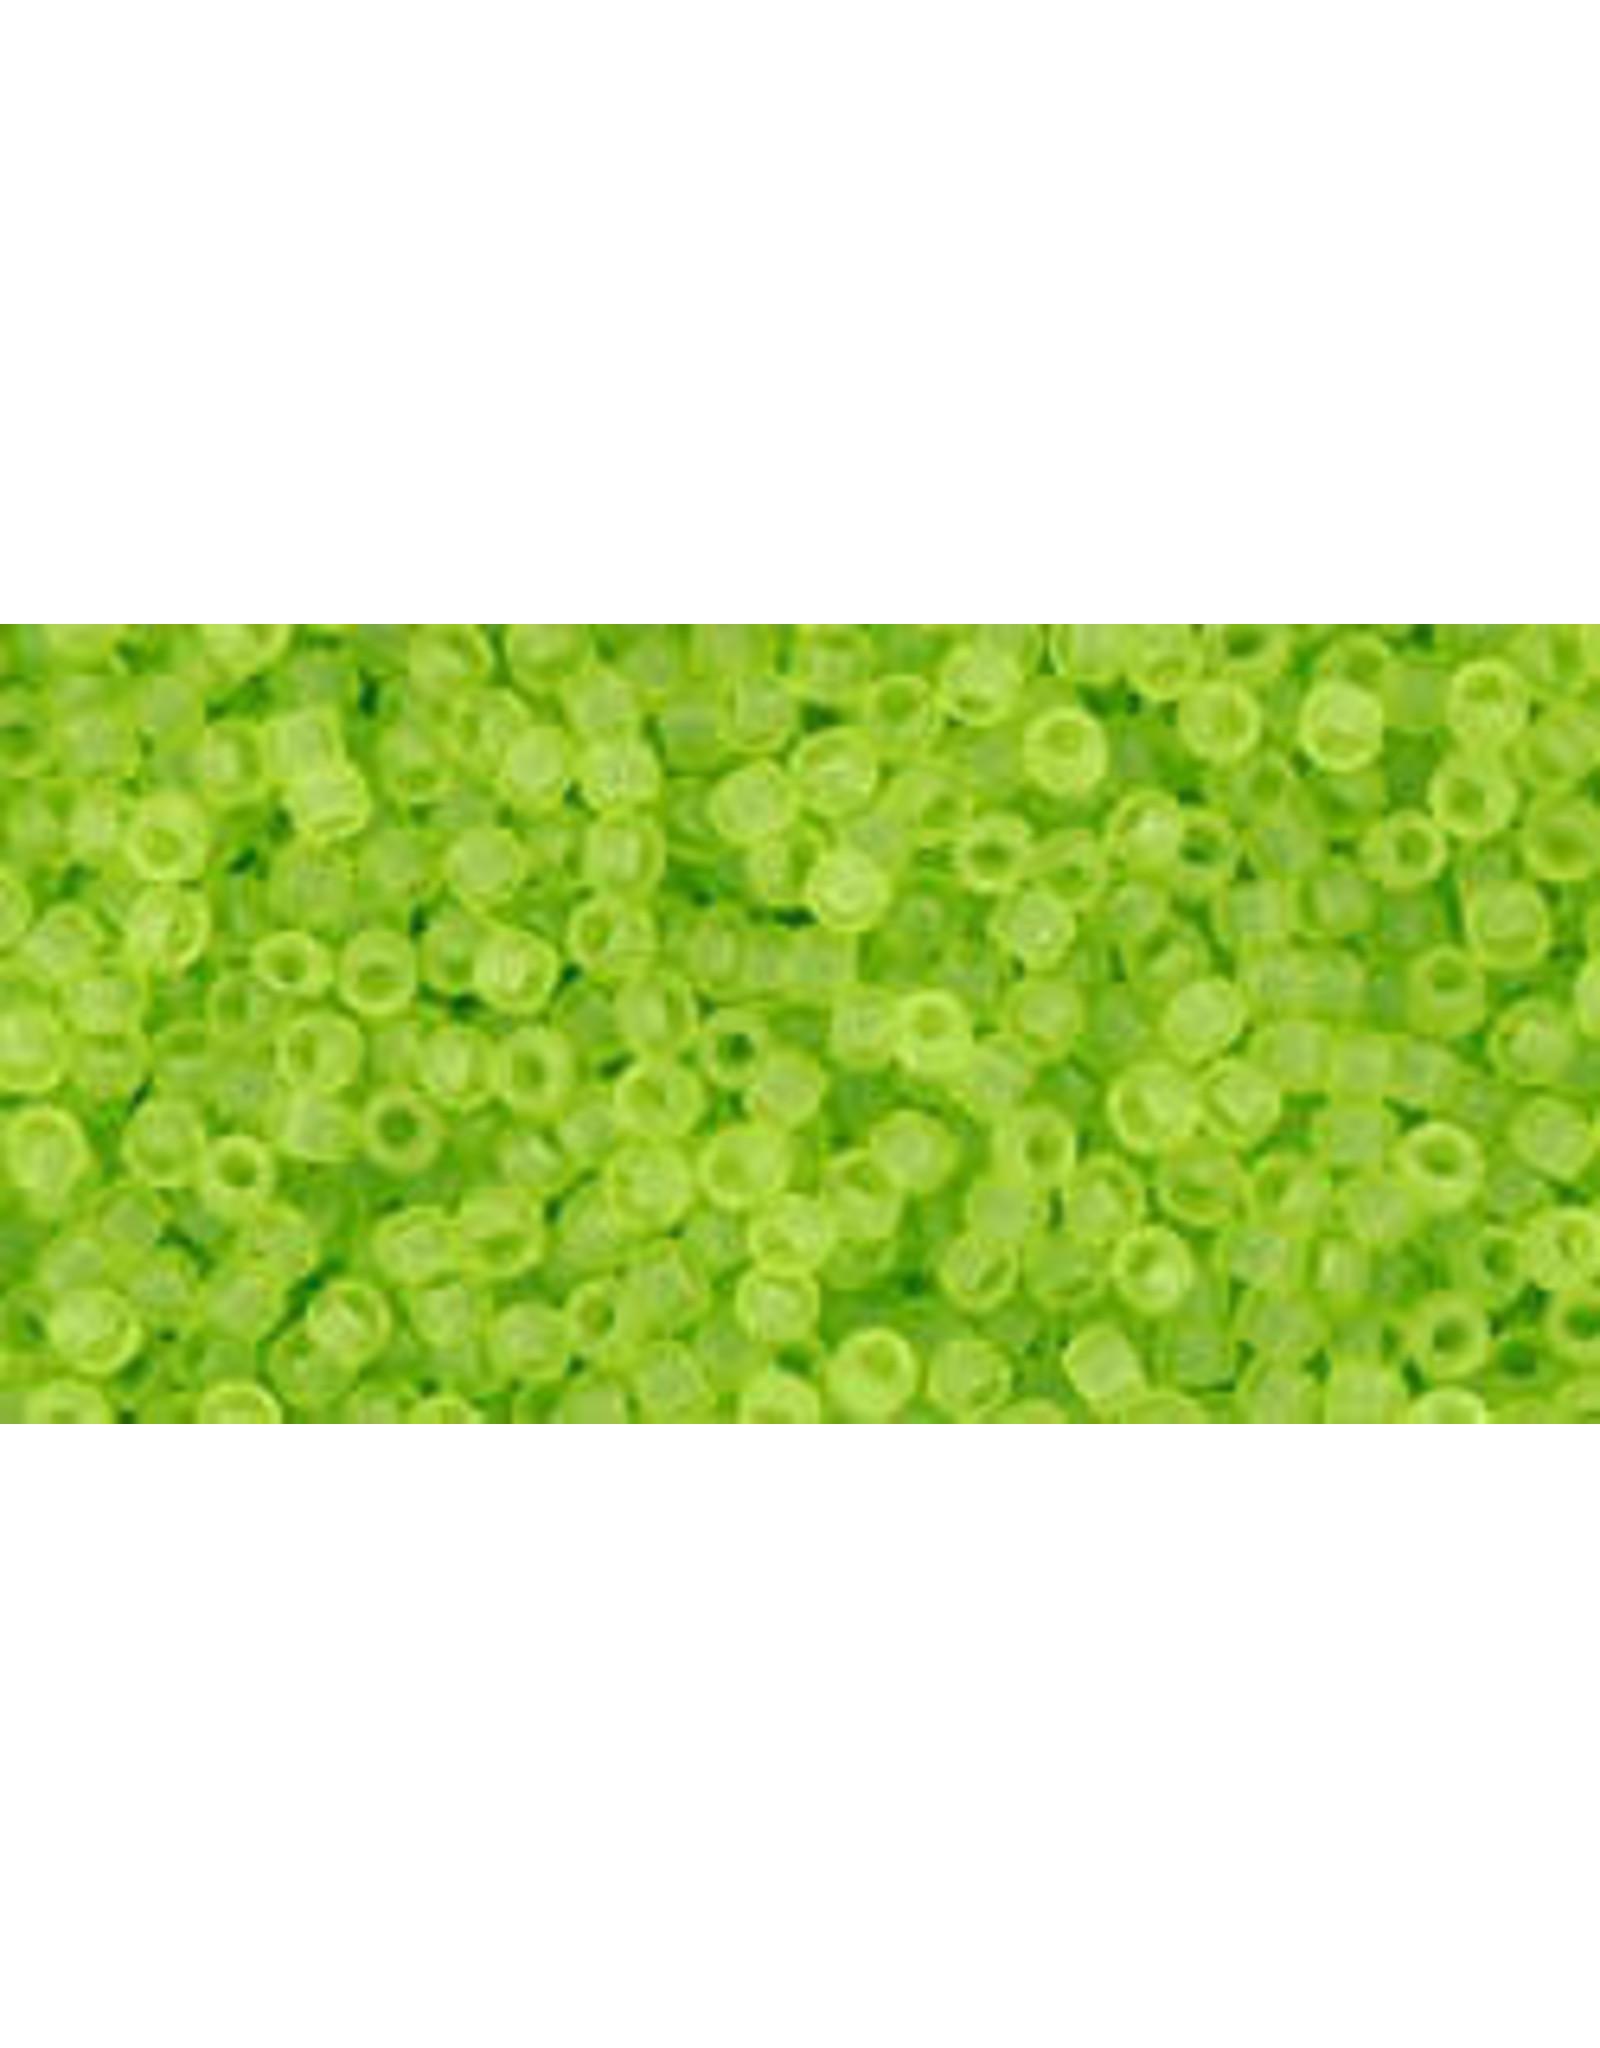 Toho 4f 15  Seed 6g  Transparent Lime Green Matte